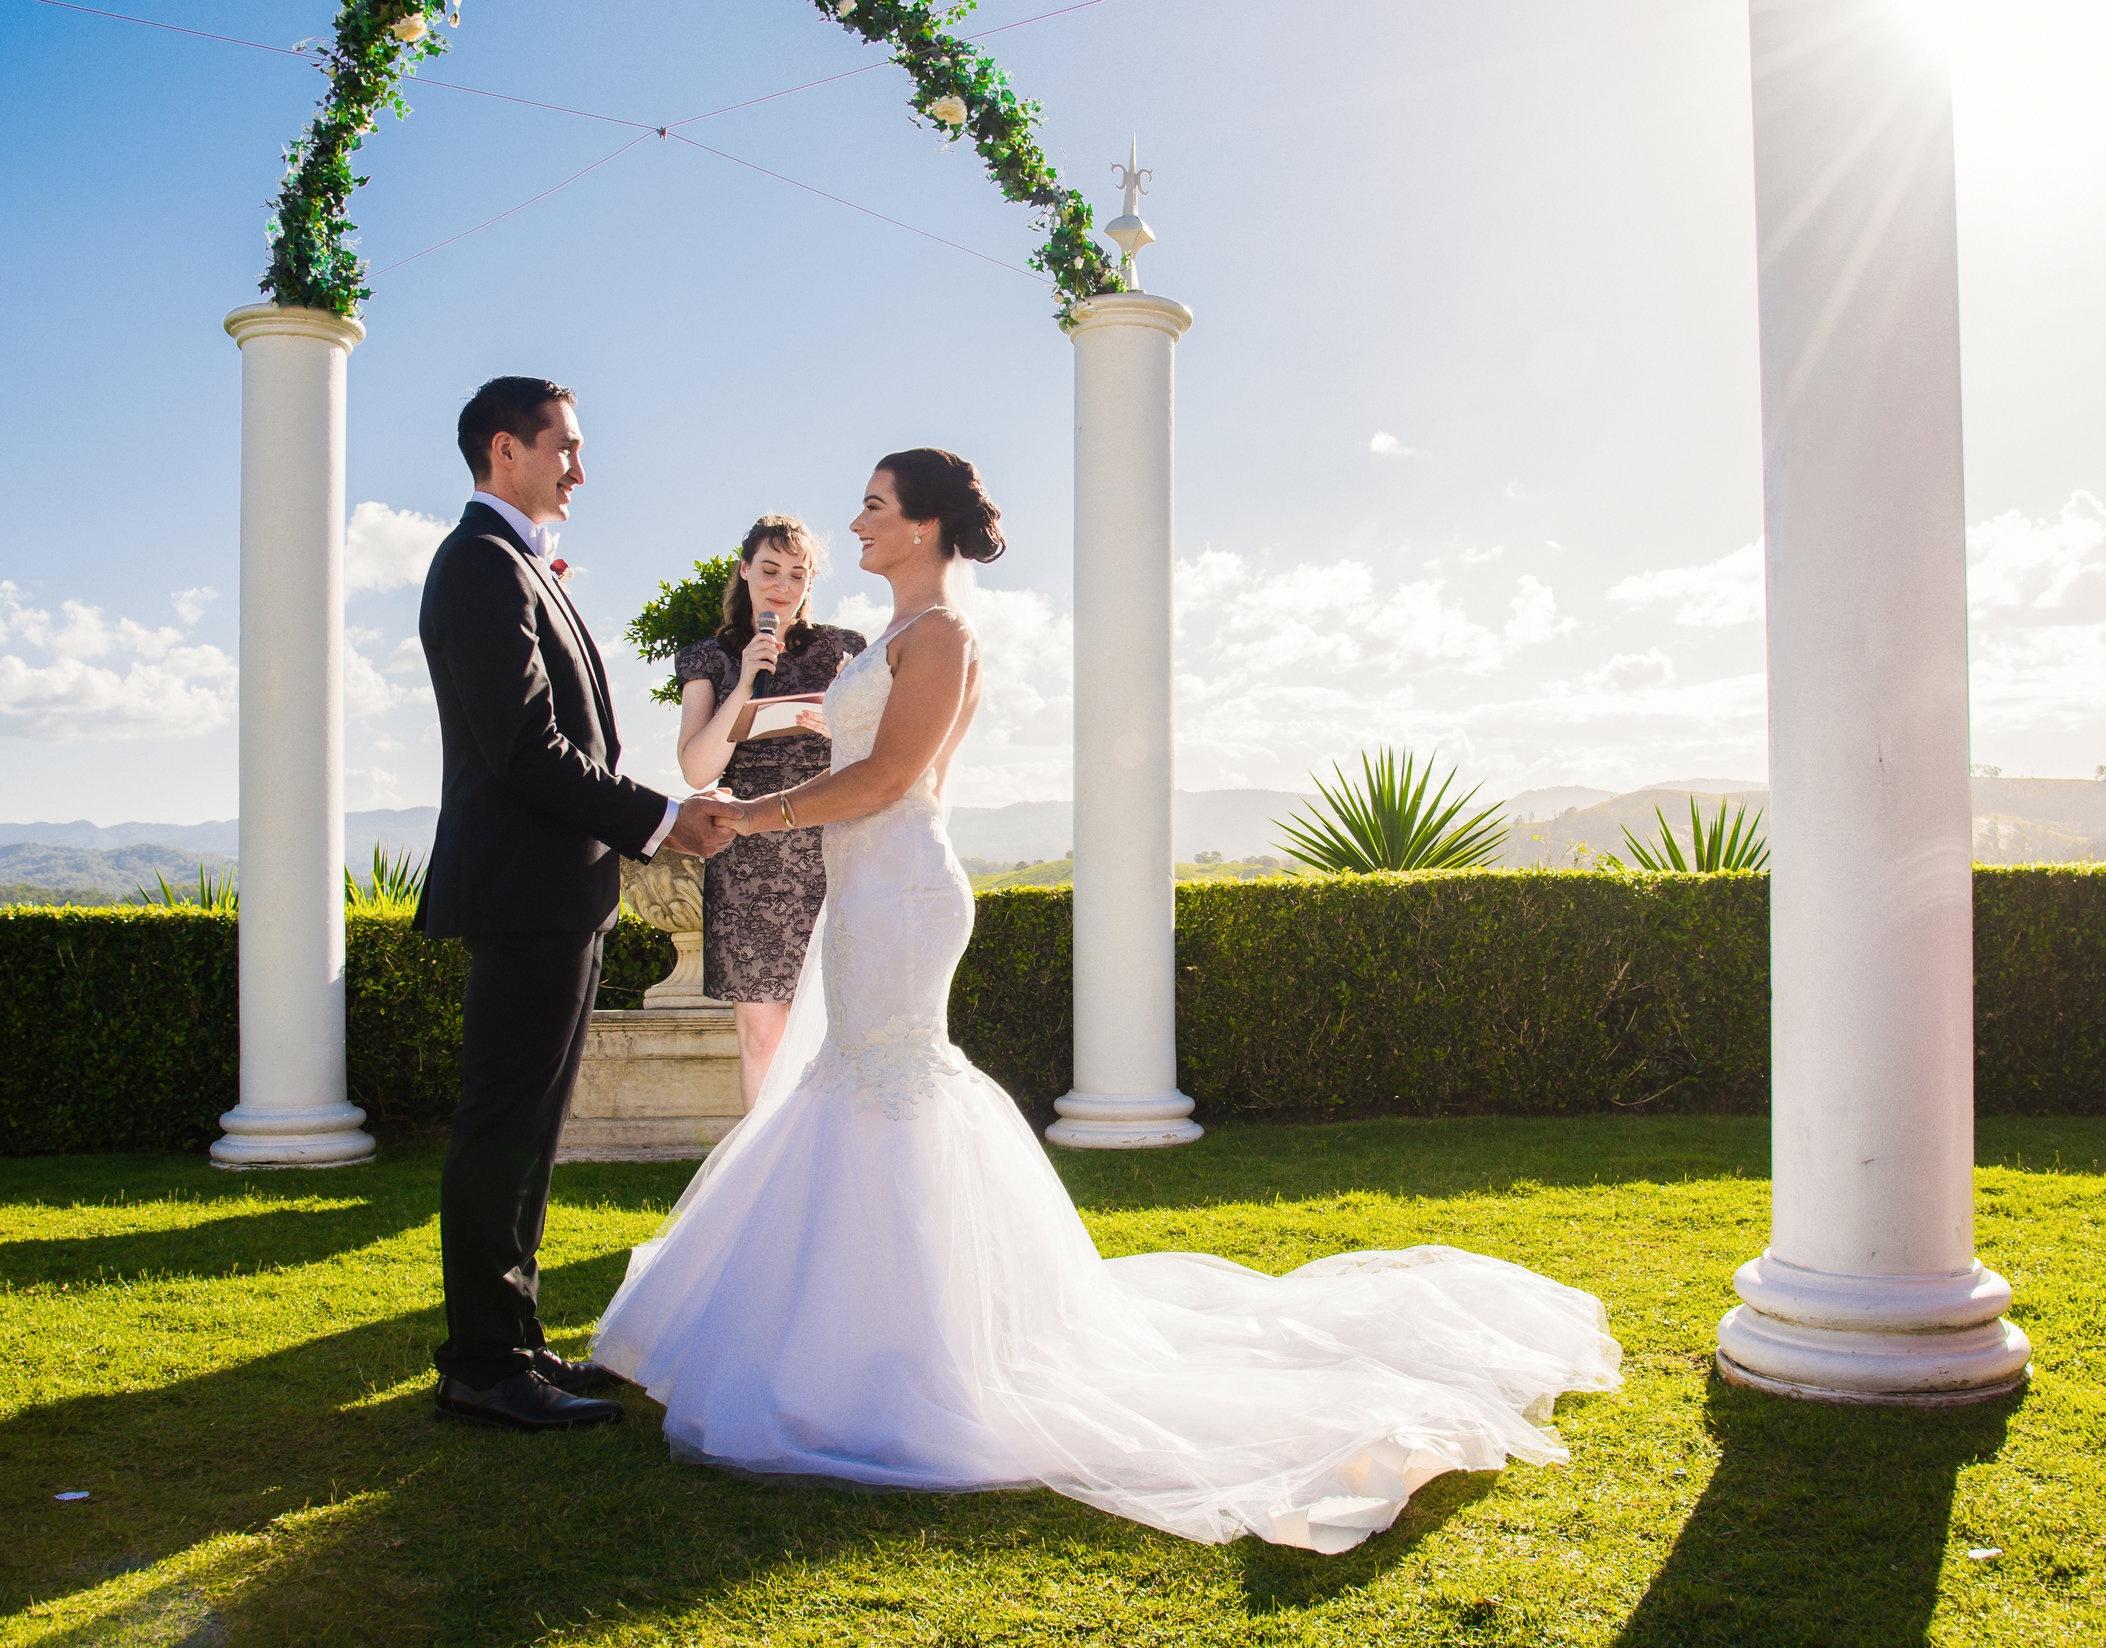 Stephanie+and+Tim+Wedding+Collection-274.jpg